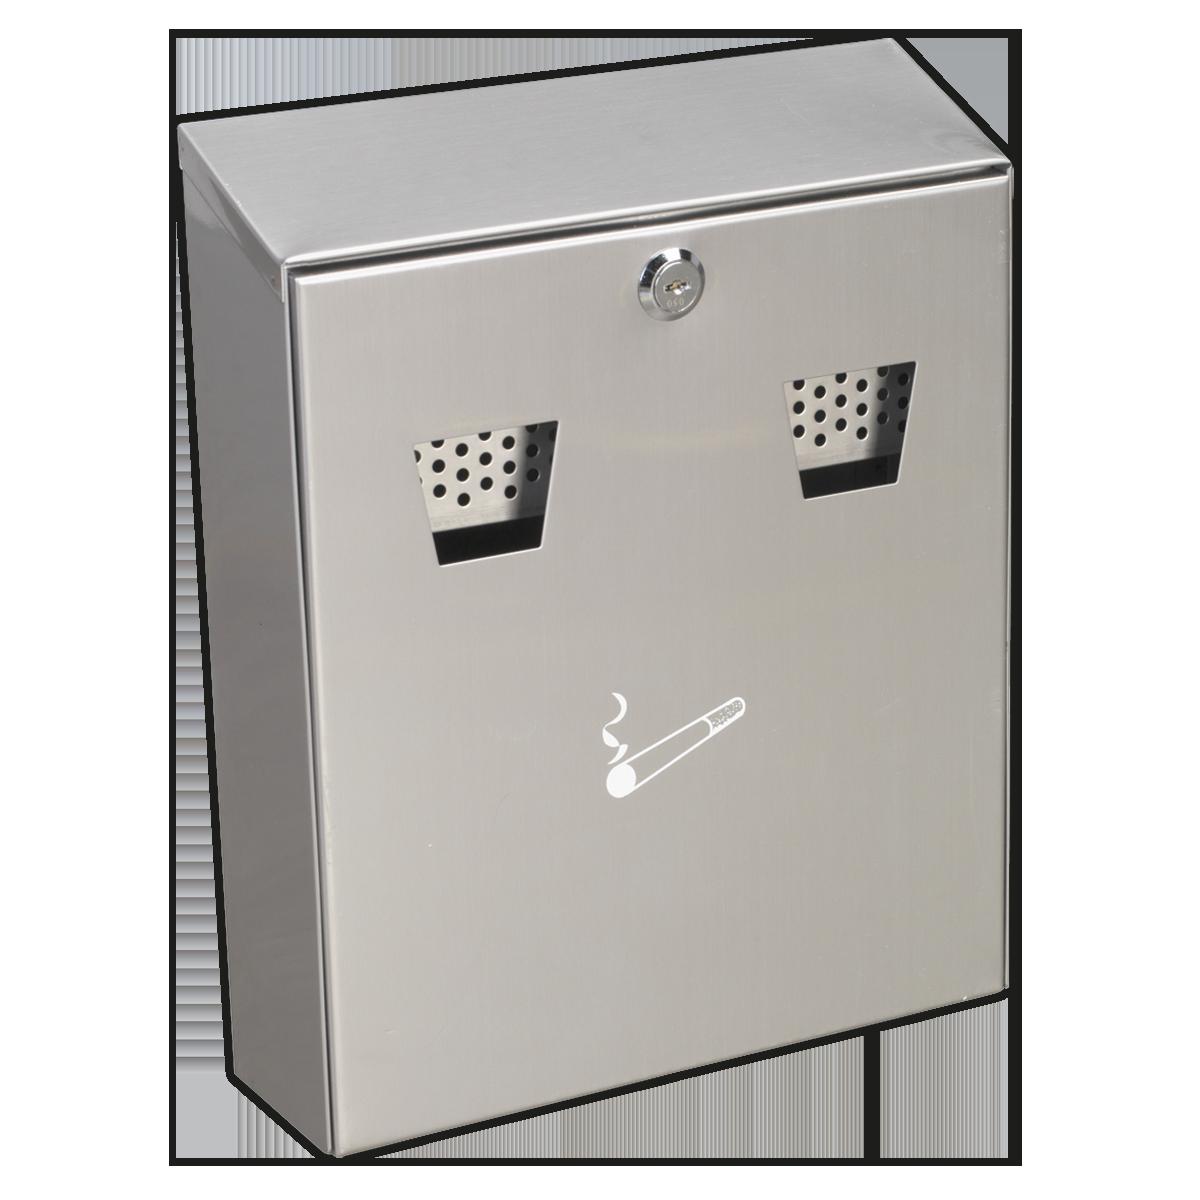 Cigarette Bin Wall Mounting Stainless Steel